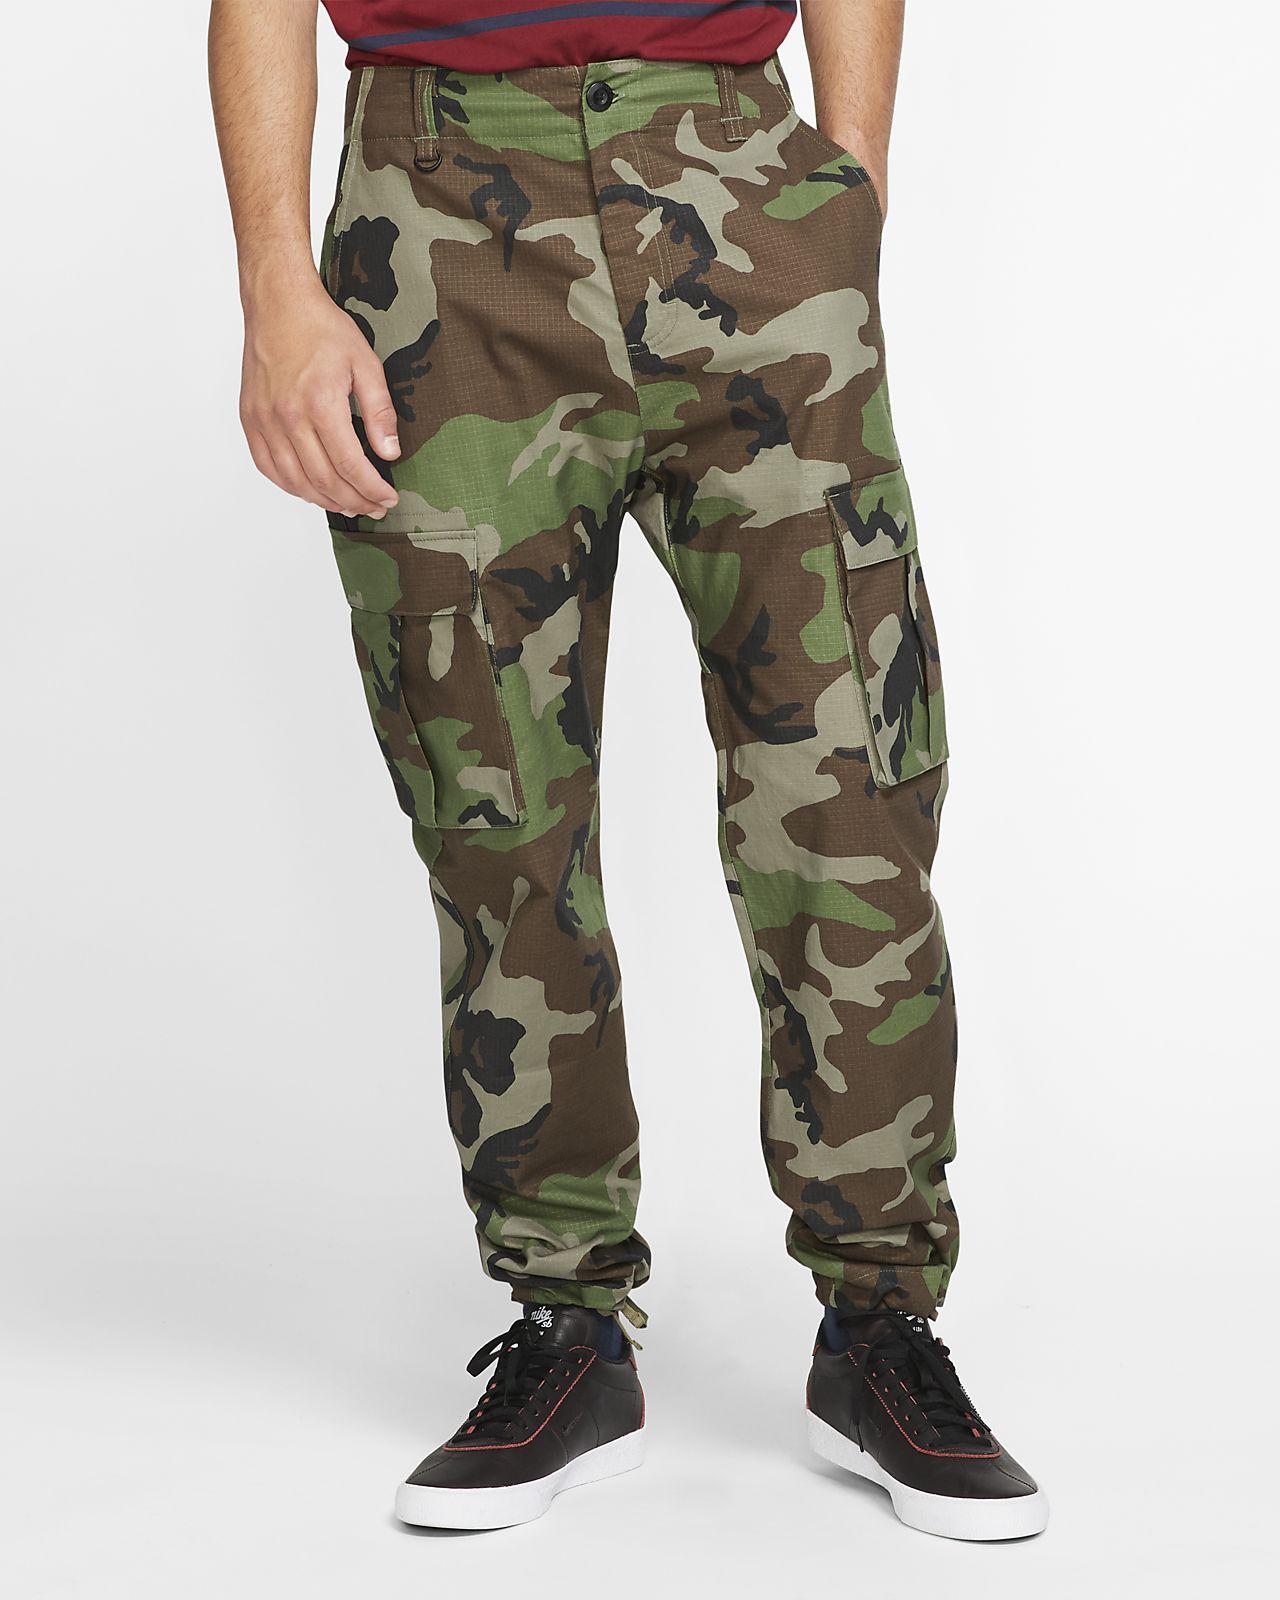 Nike SB Flex FTM Kamuflaj Desenli Erkek Kaykay Kargo Pantolon